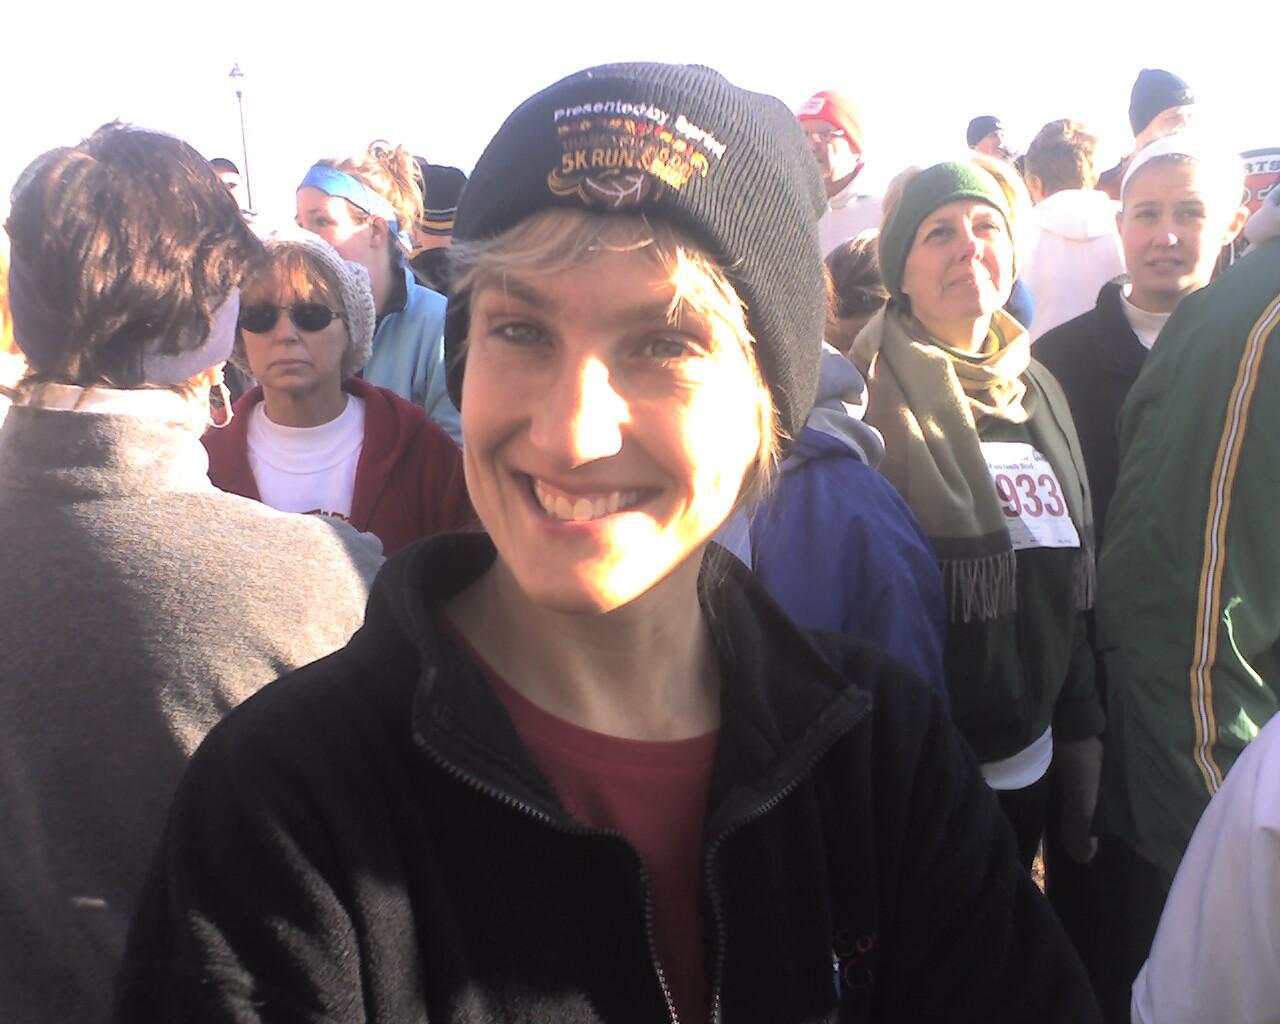 Wife - Sprint Thanksgiving 5k a